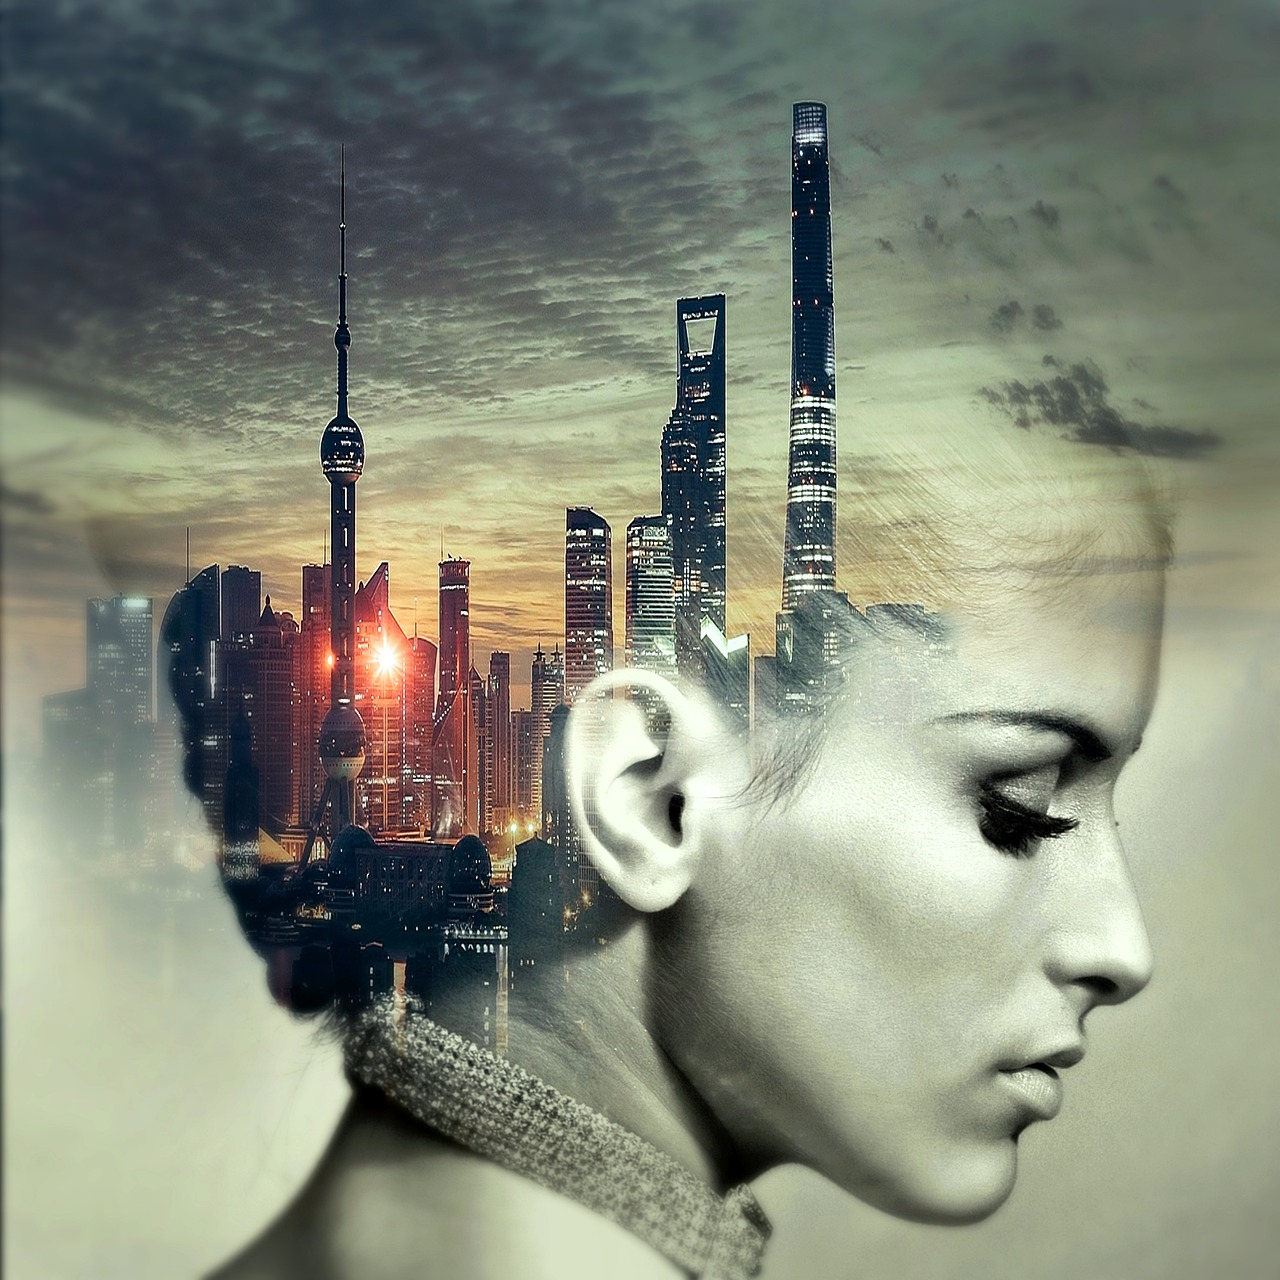 cd cover, head, city